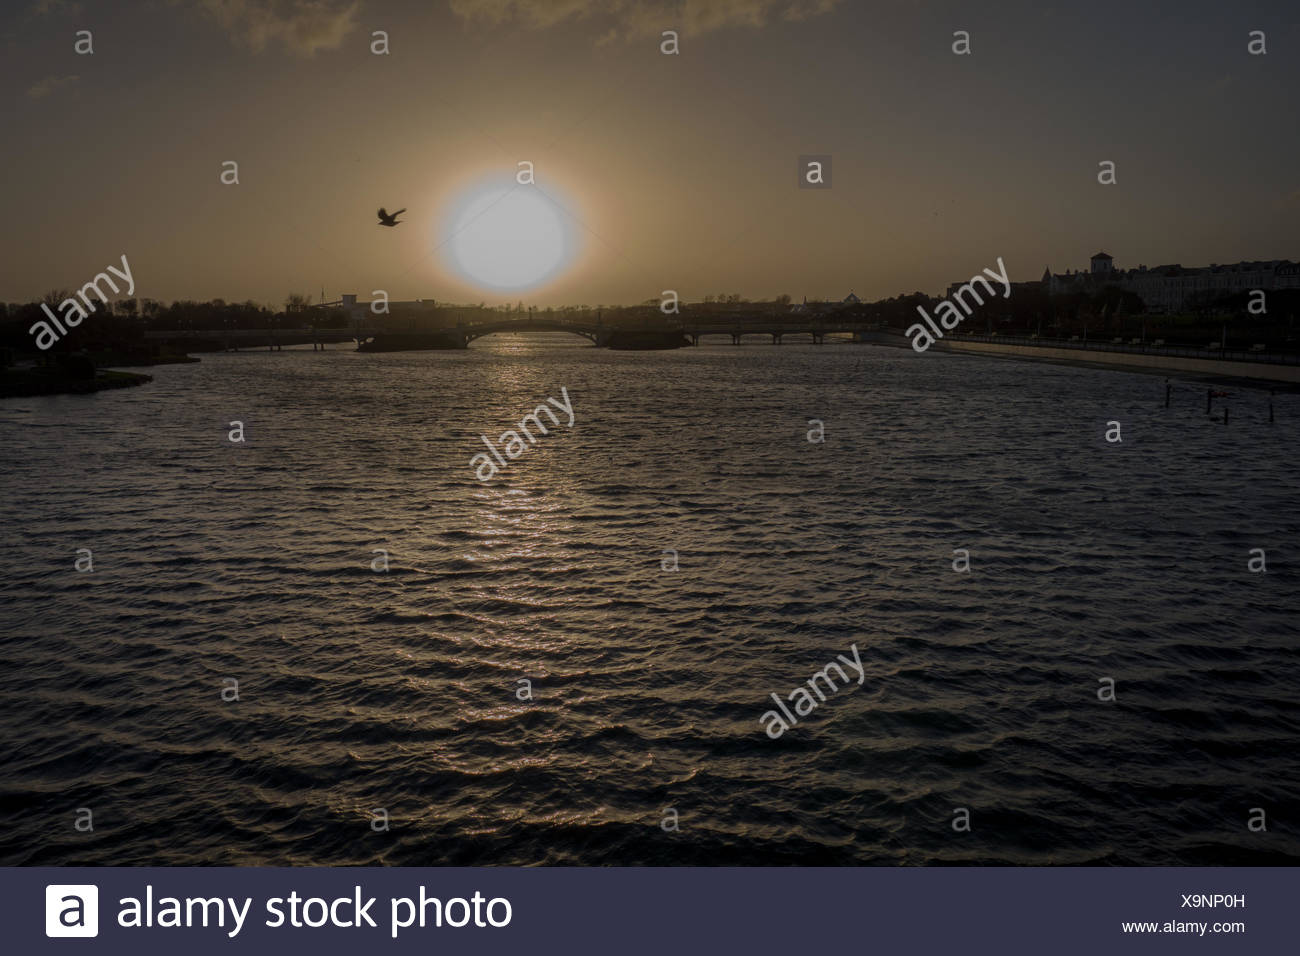 Scenic View Of Marine Lake During Sunset - Stock Image